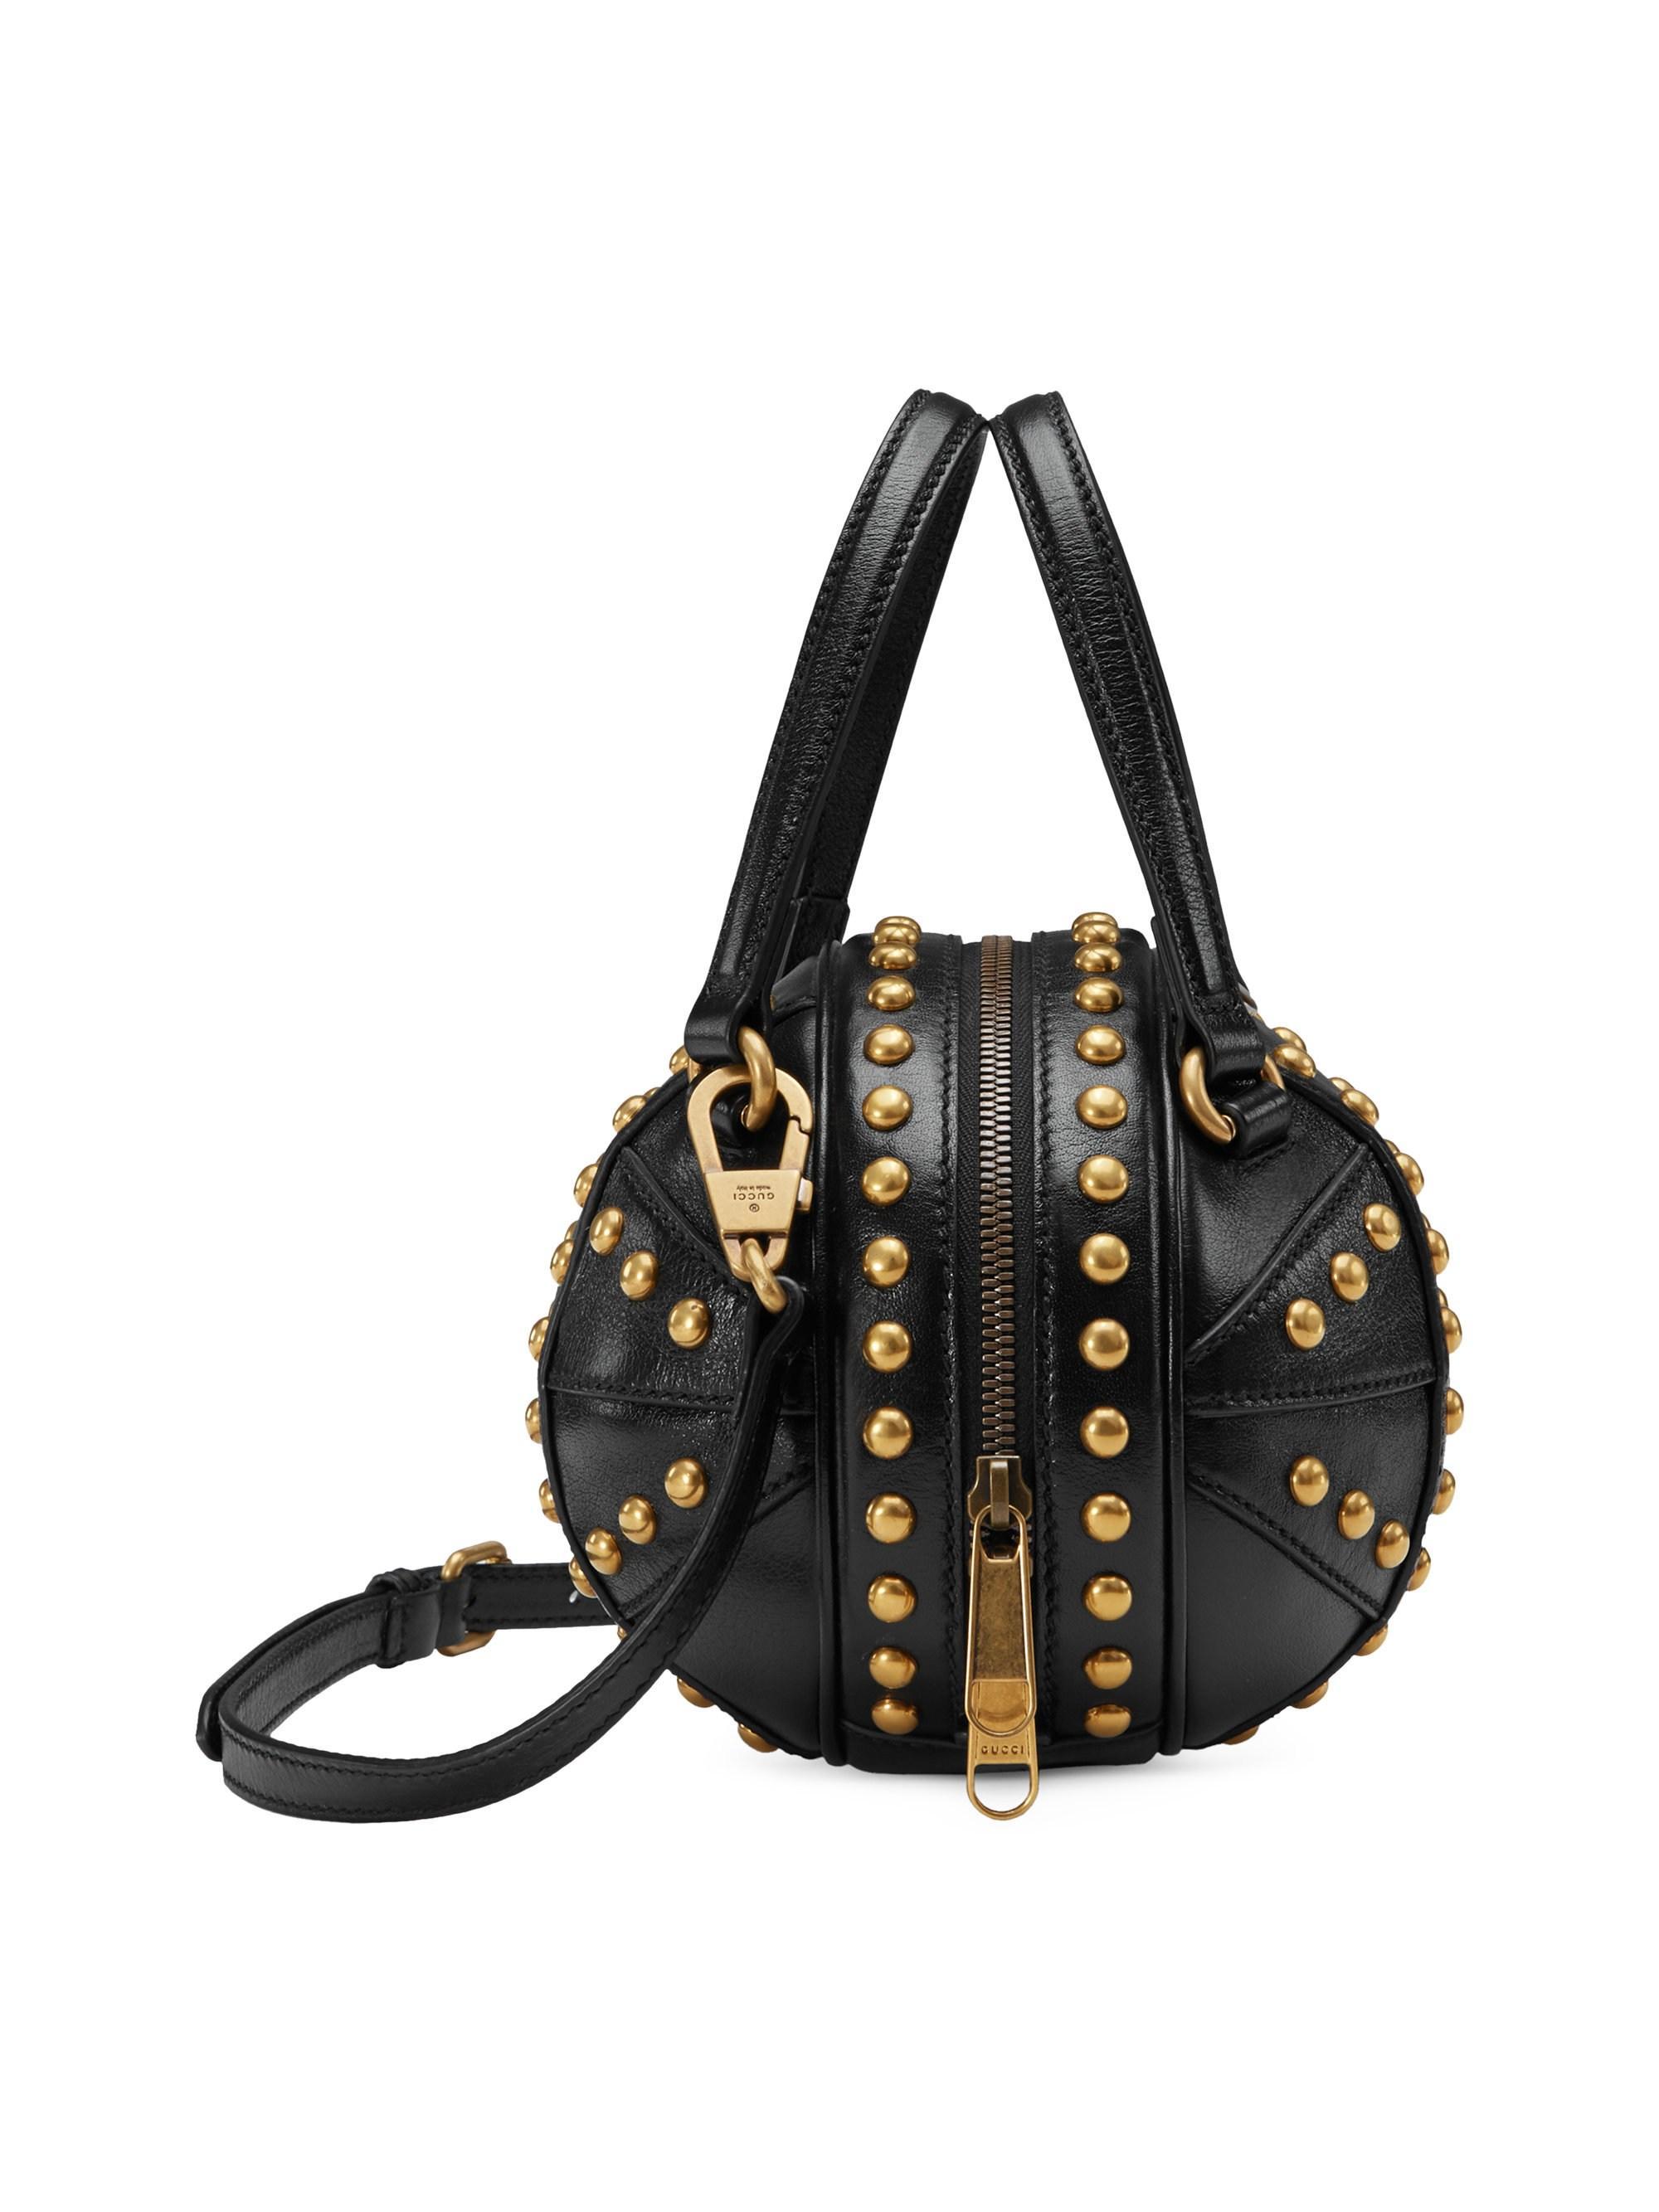 3c9f8aa99 Gucci Mini Tifosa Leather Shoulder Bag in Black - Lyst